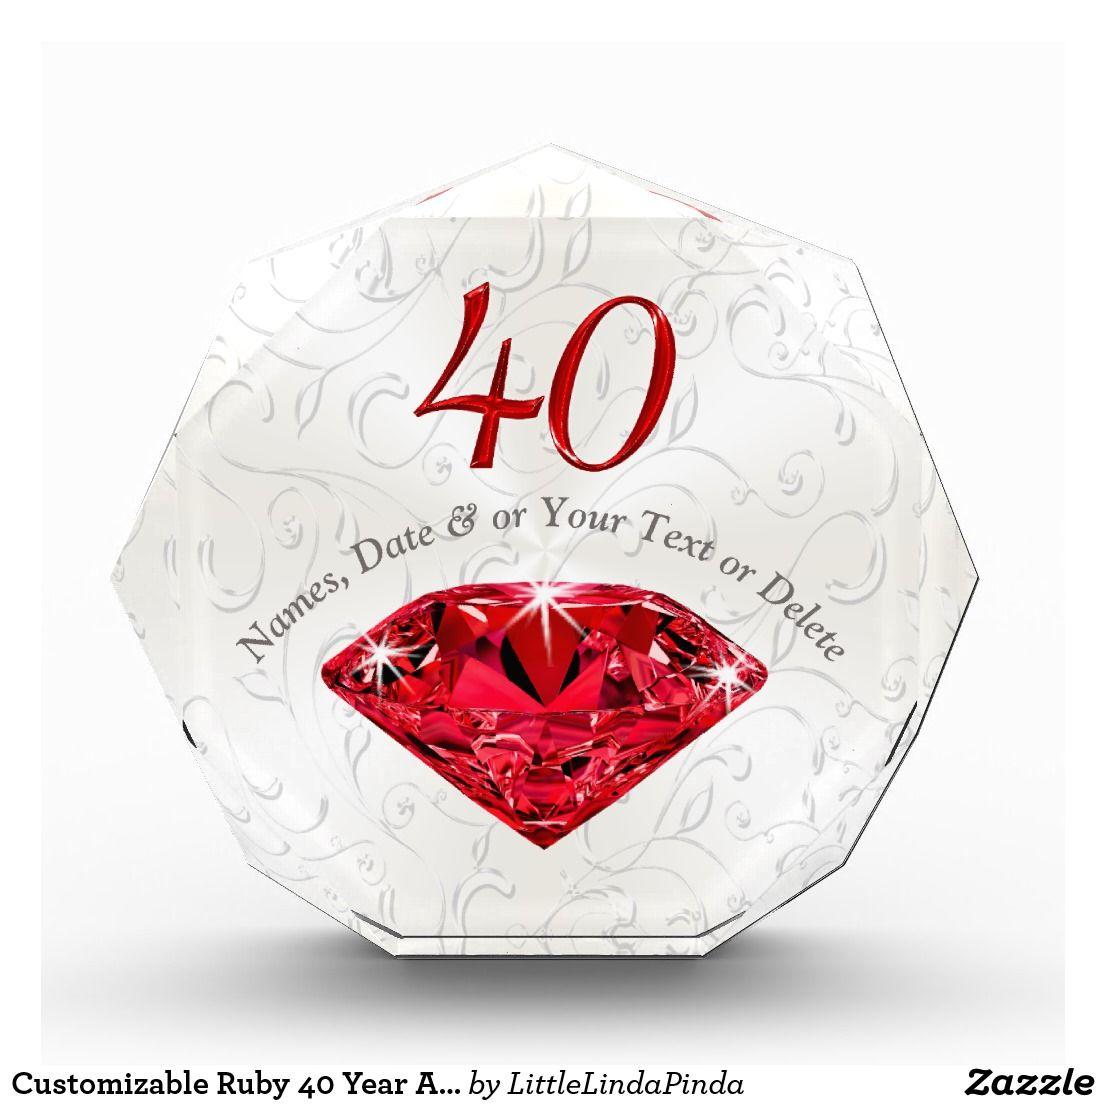 Gift Ideas 40th Wedding Anniversary: Customizable Ruby 40 Year Anniversary Gift Ideas